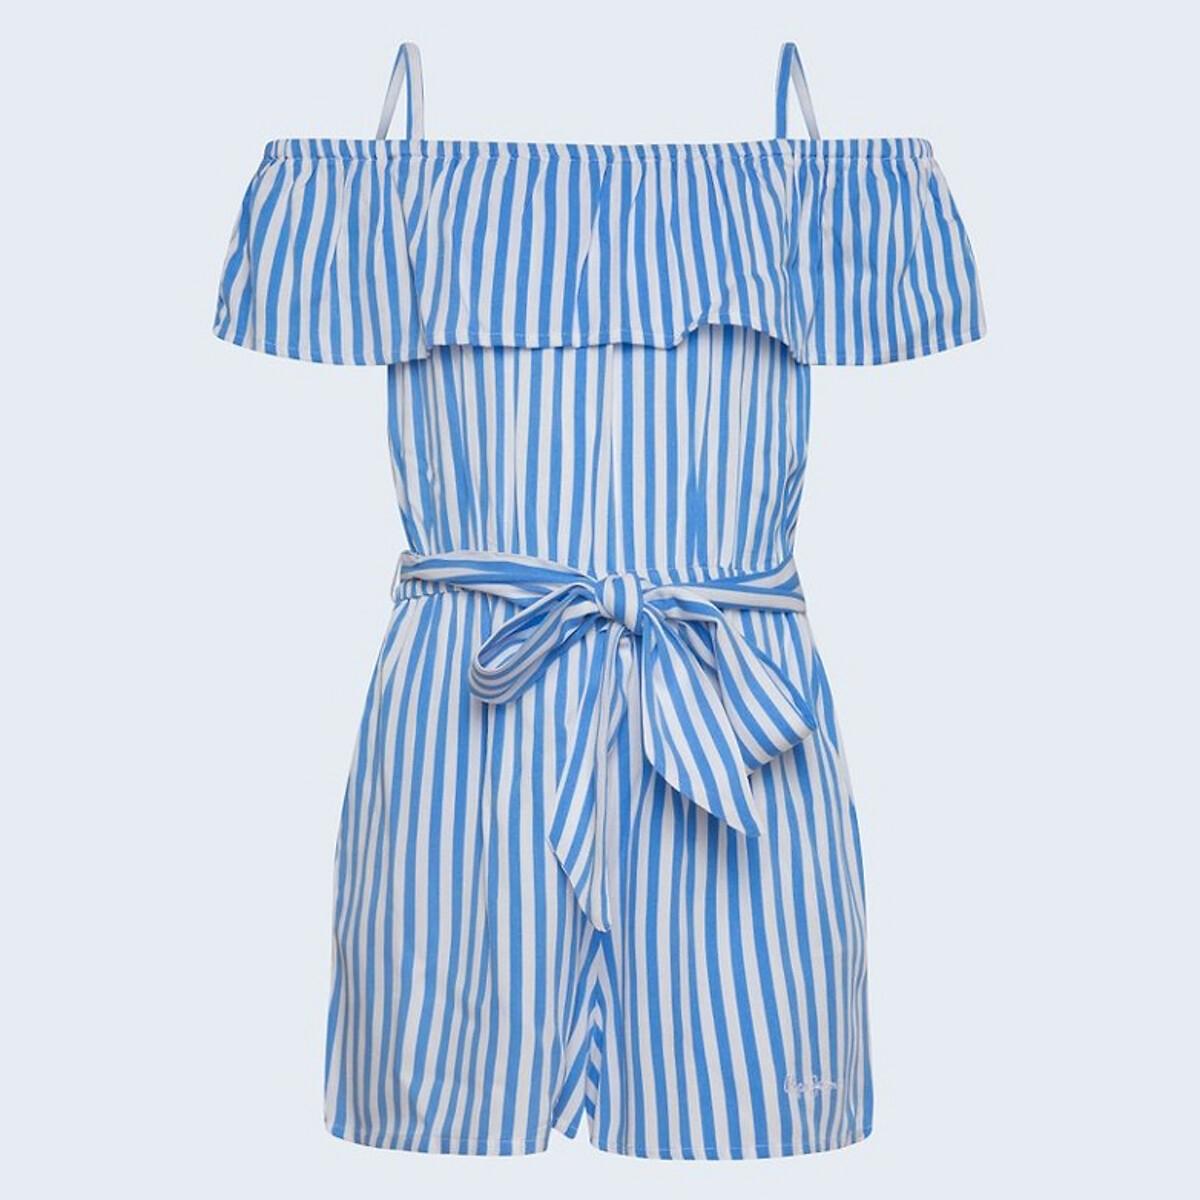 Фото - Комбинезон LaRedoute С шортами в полоску 14 синий пижама laredoute с шортами в полоску m синий